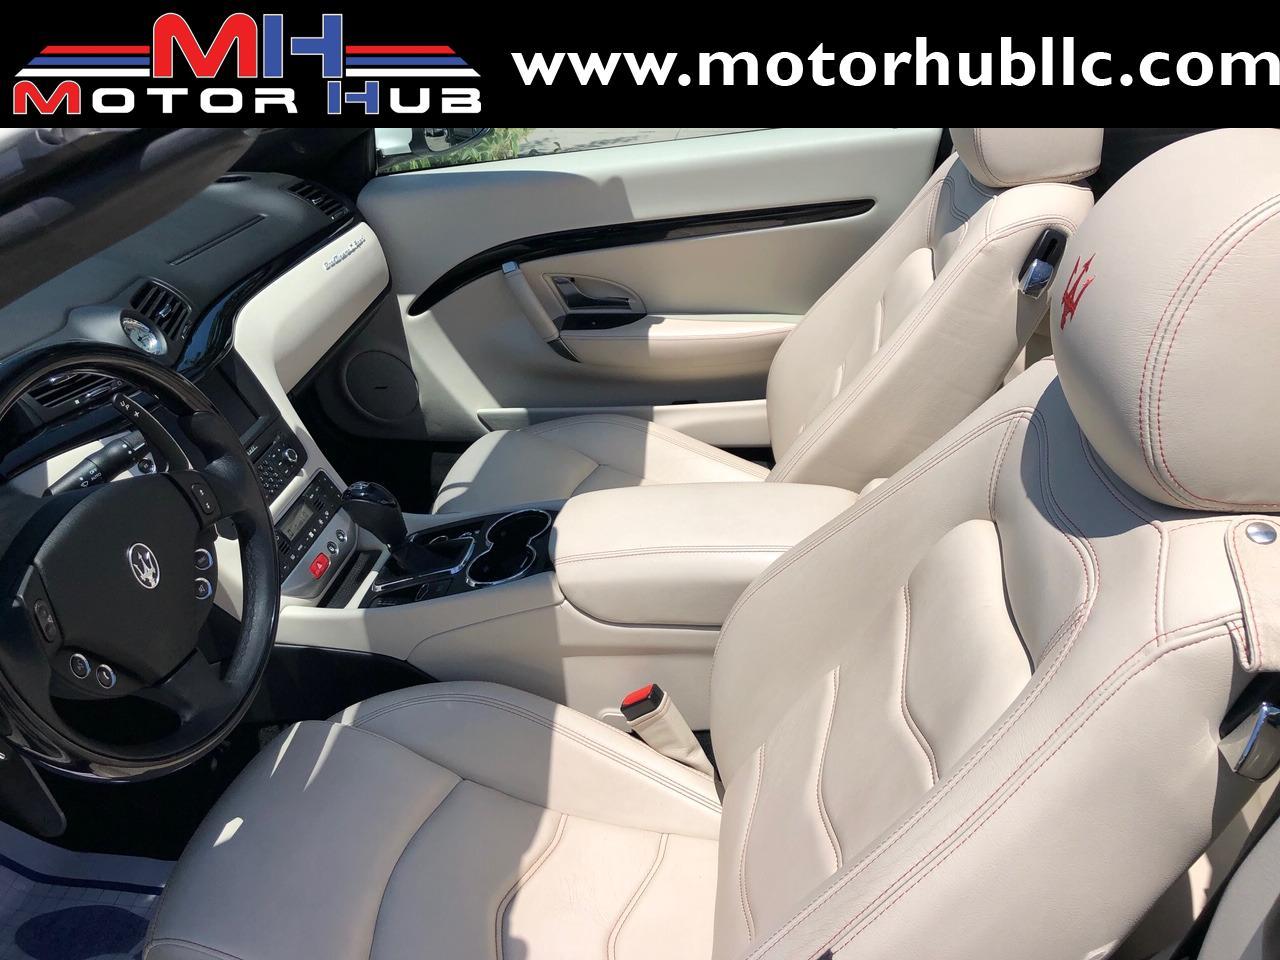 Used-2012-Maserati-GranTurismo-Sport